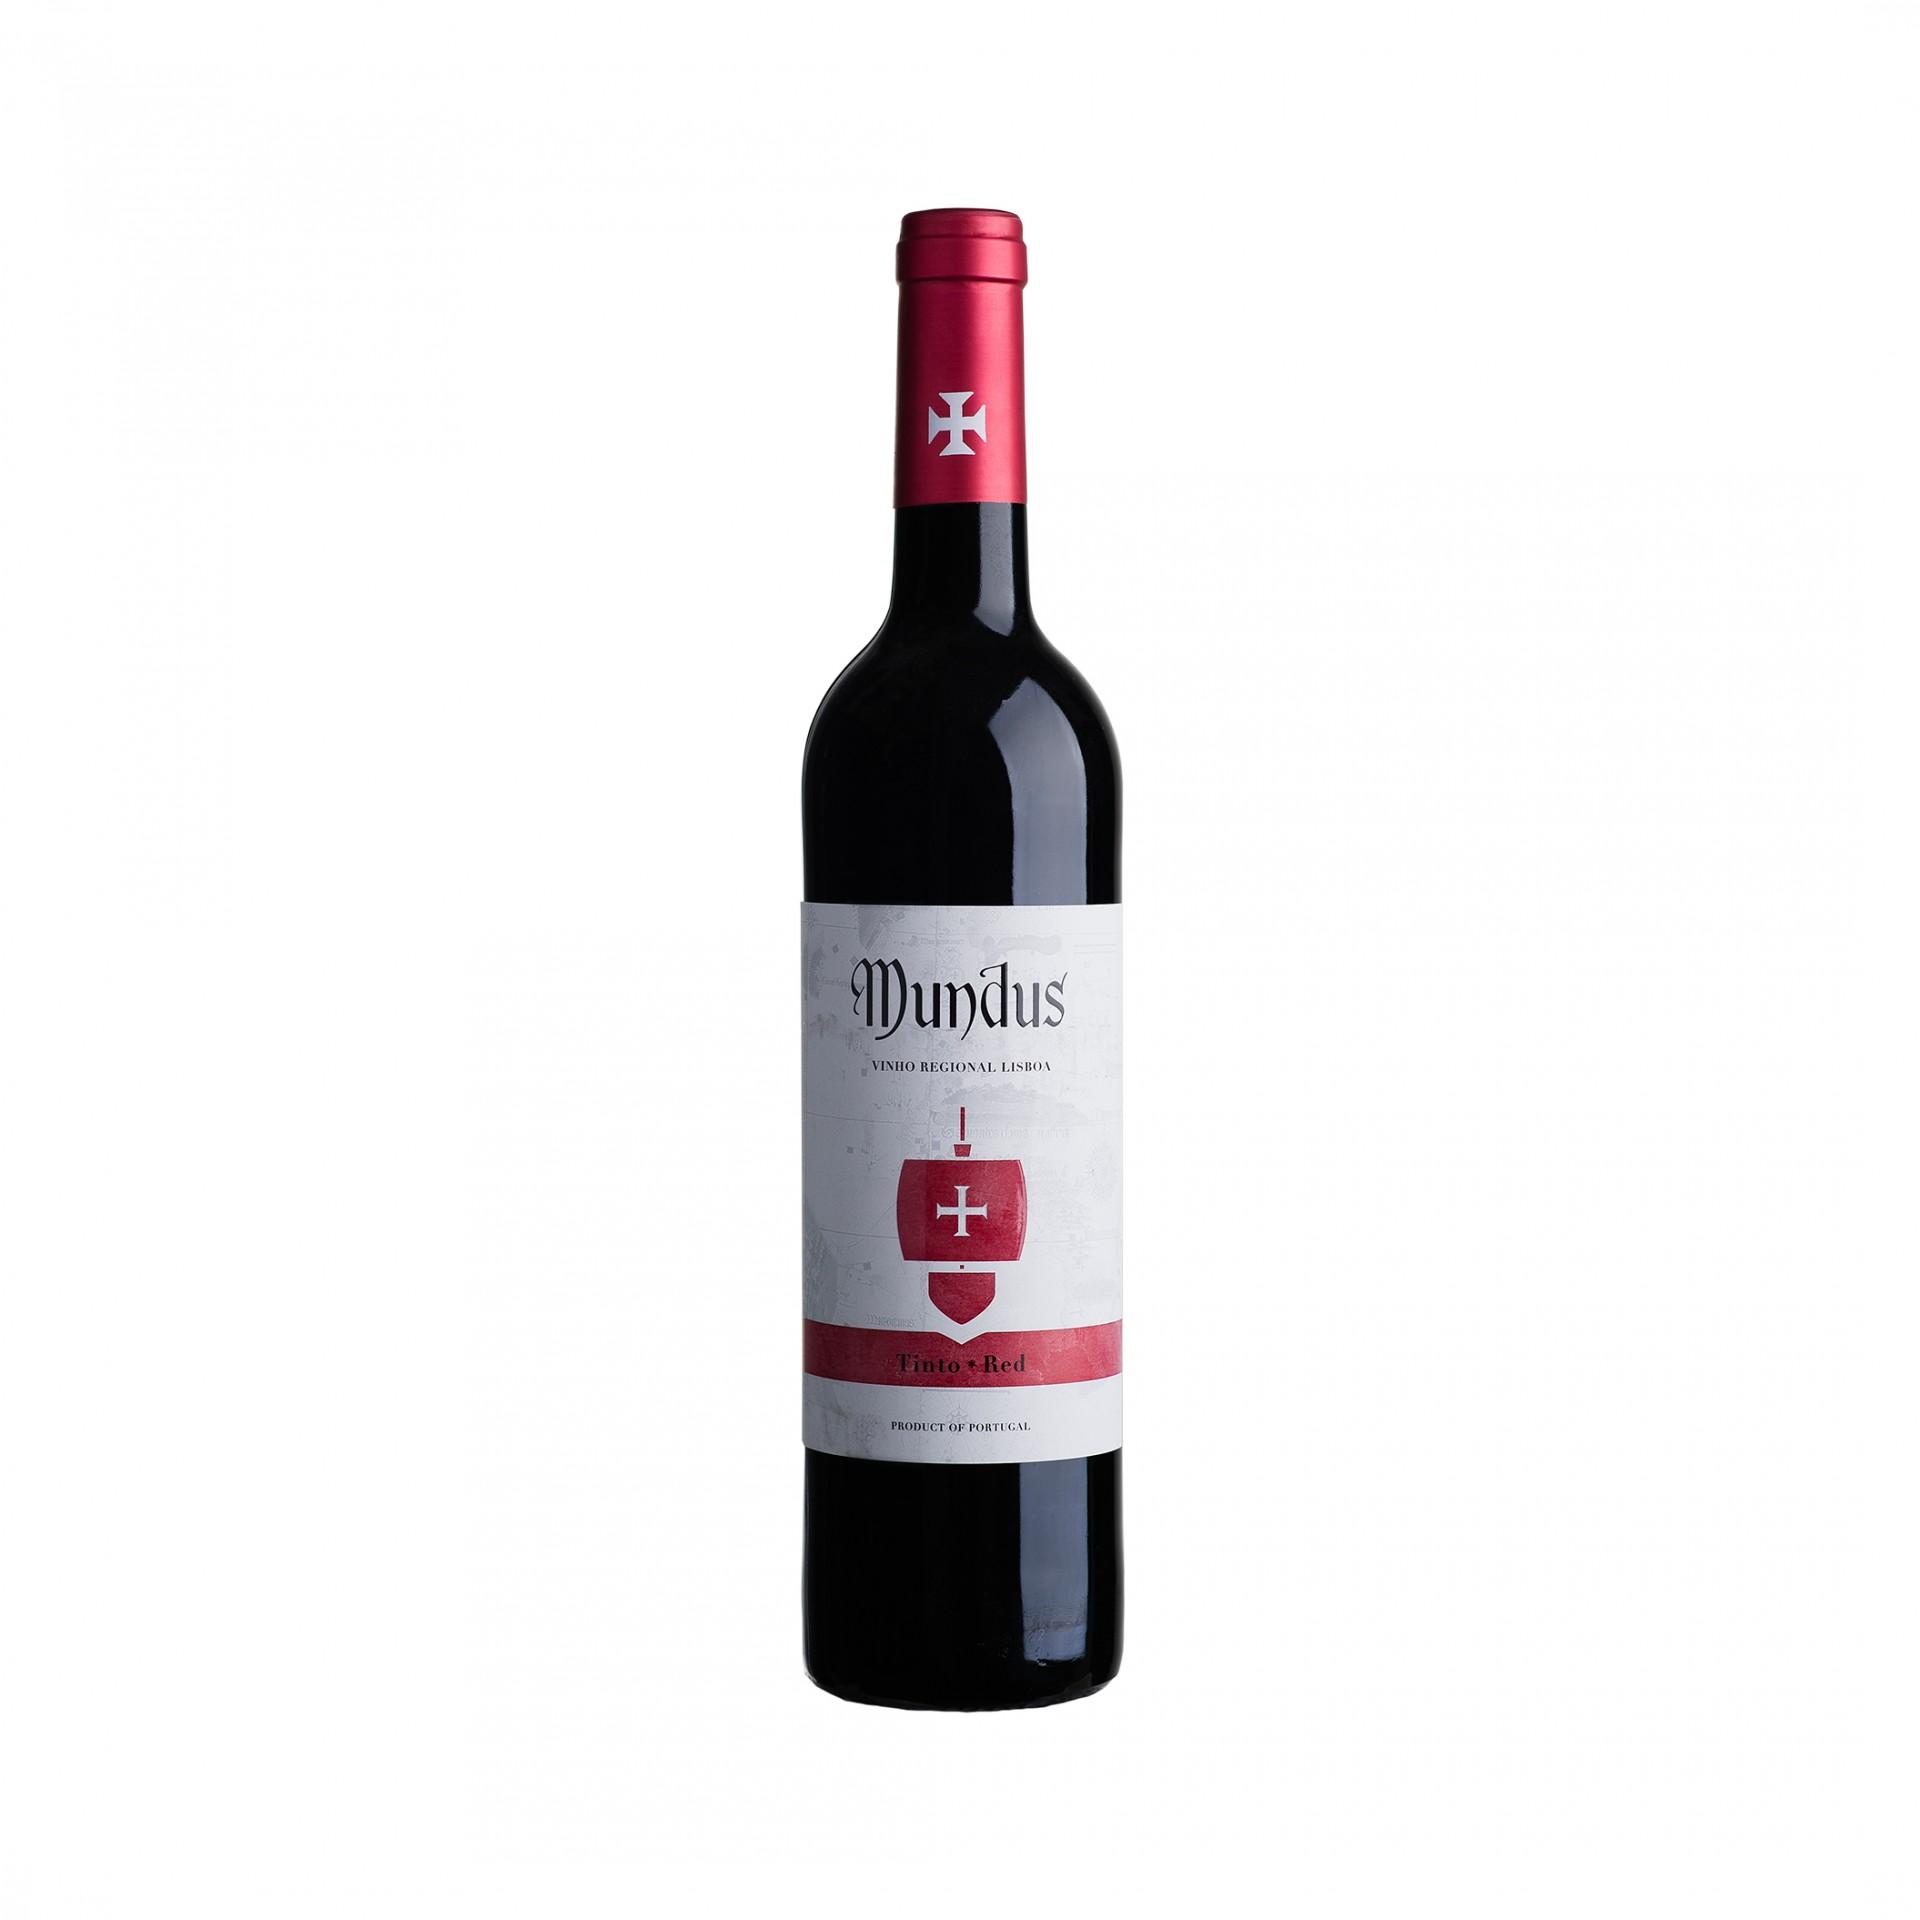 Mundus Tinto IGP Lisboa 0,75L 13,0%